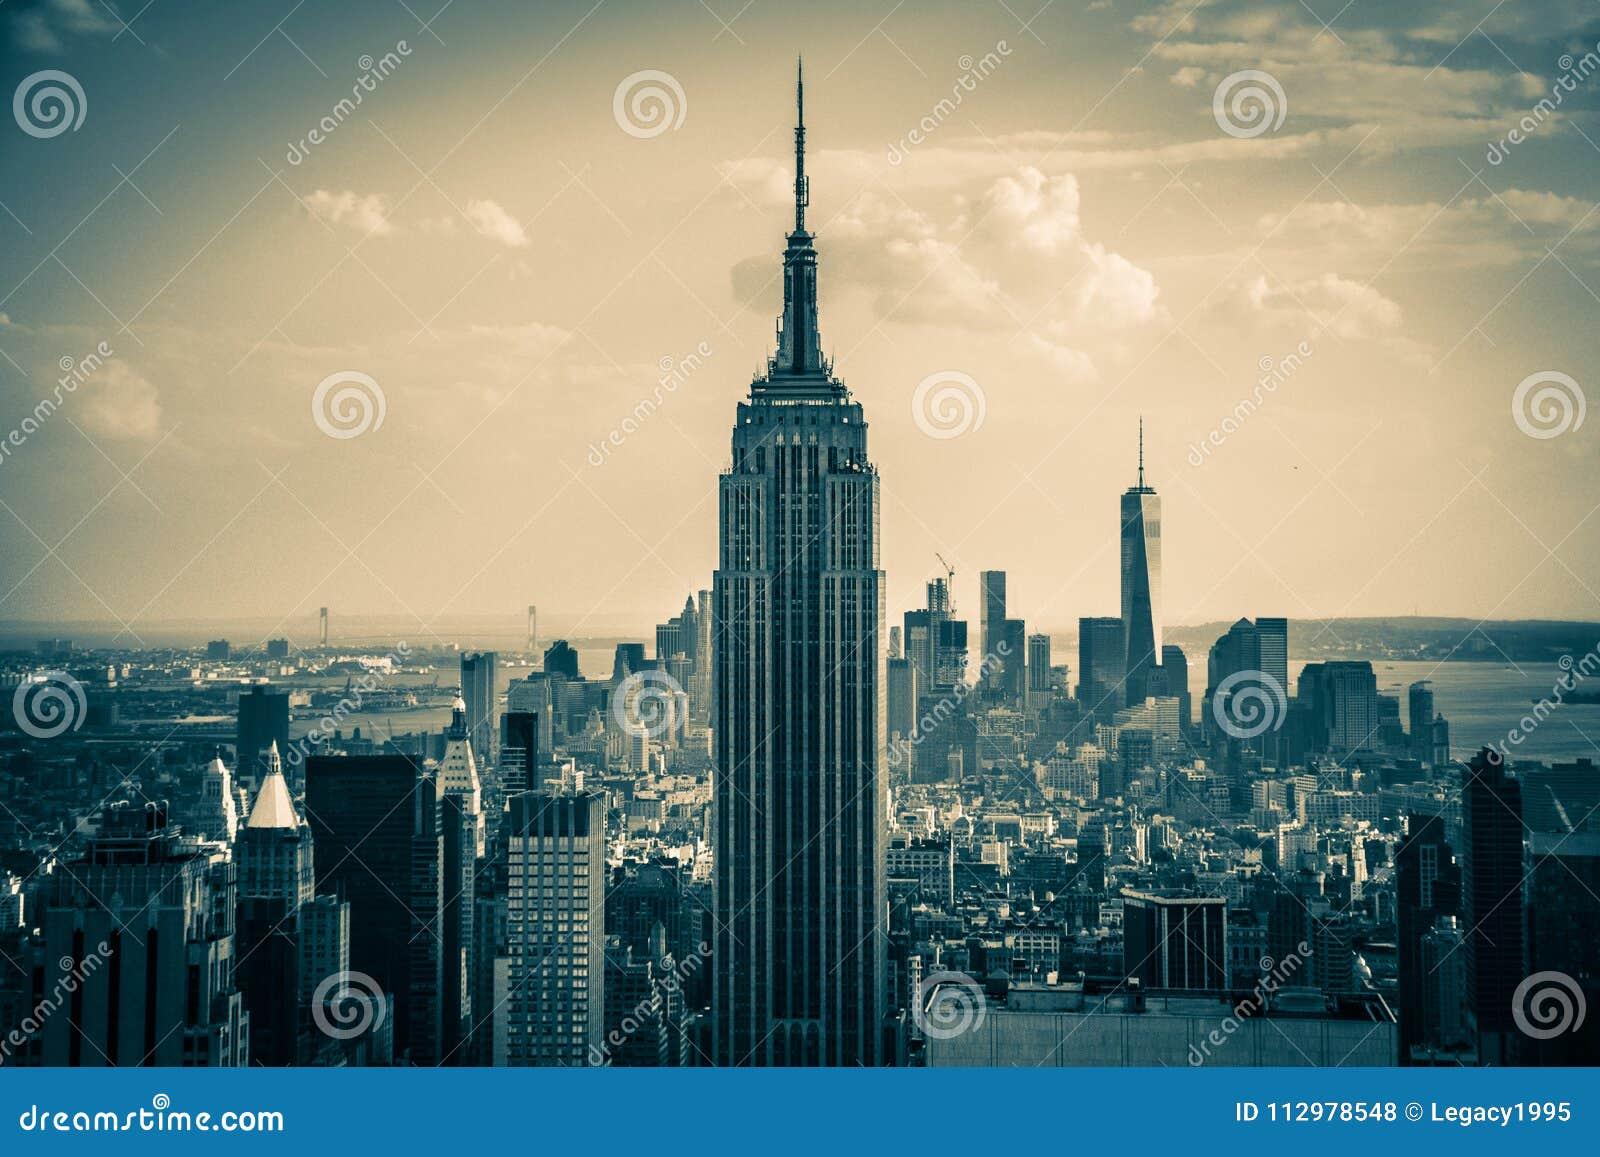 New York City The Empire States Building and Manhattan Skyline